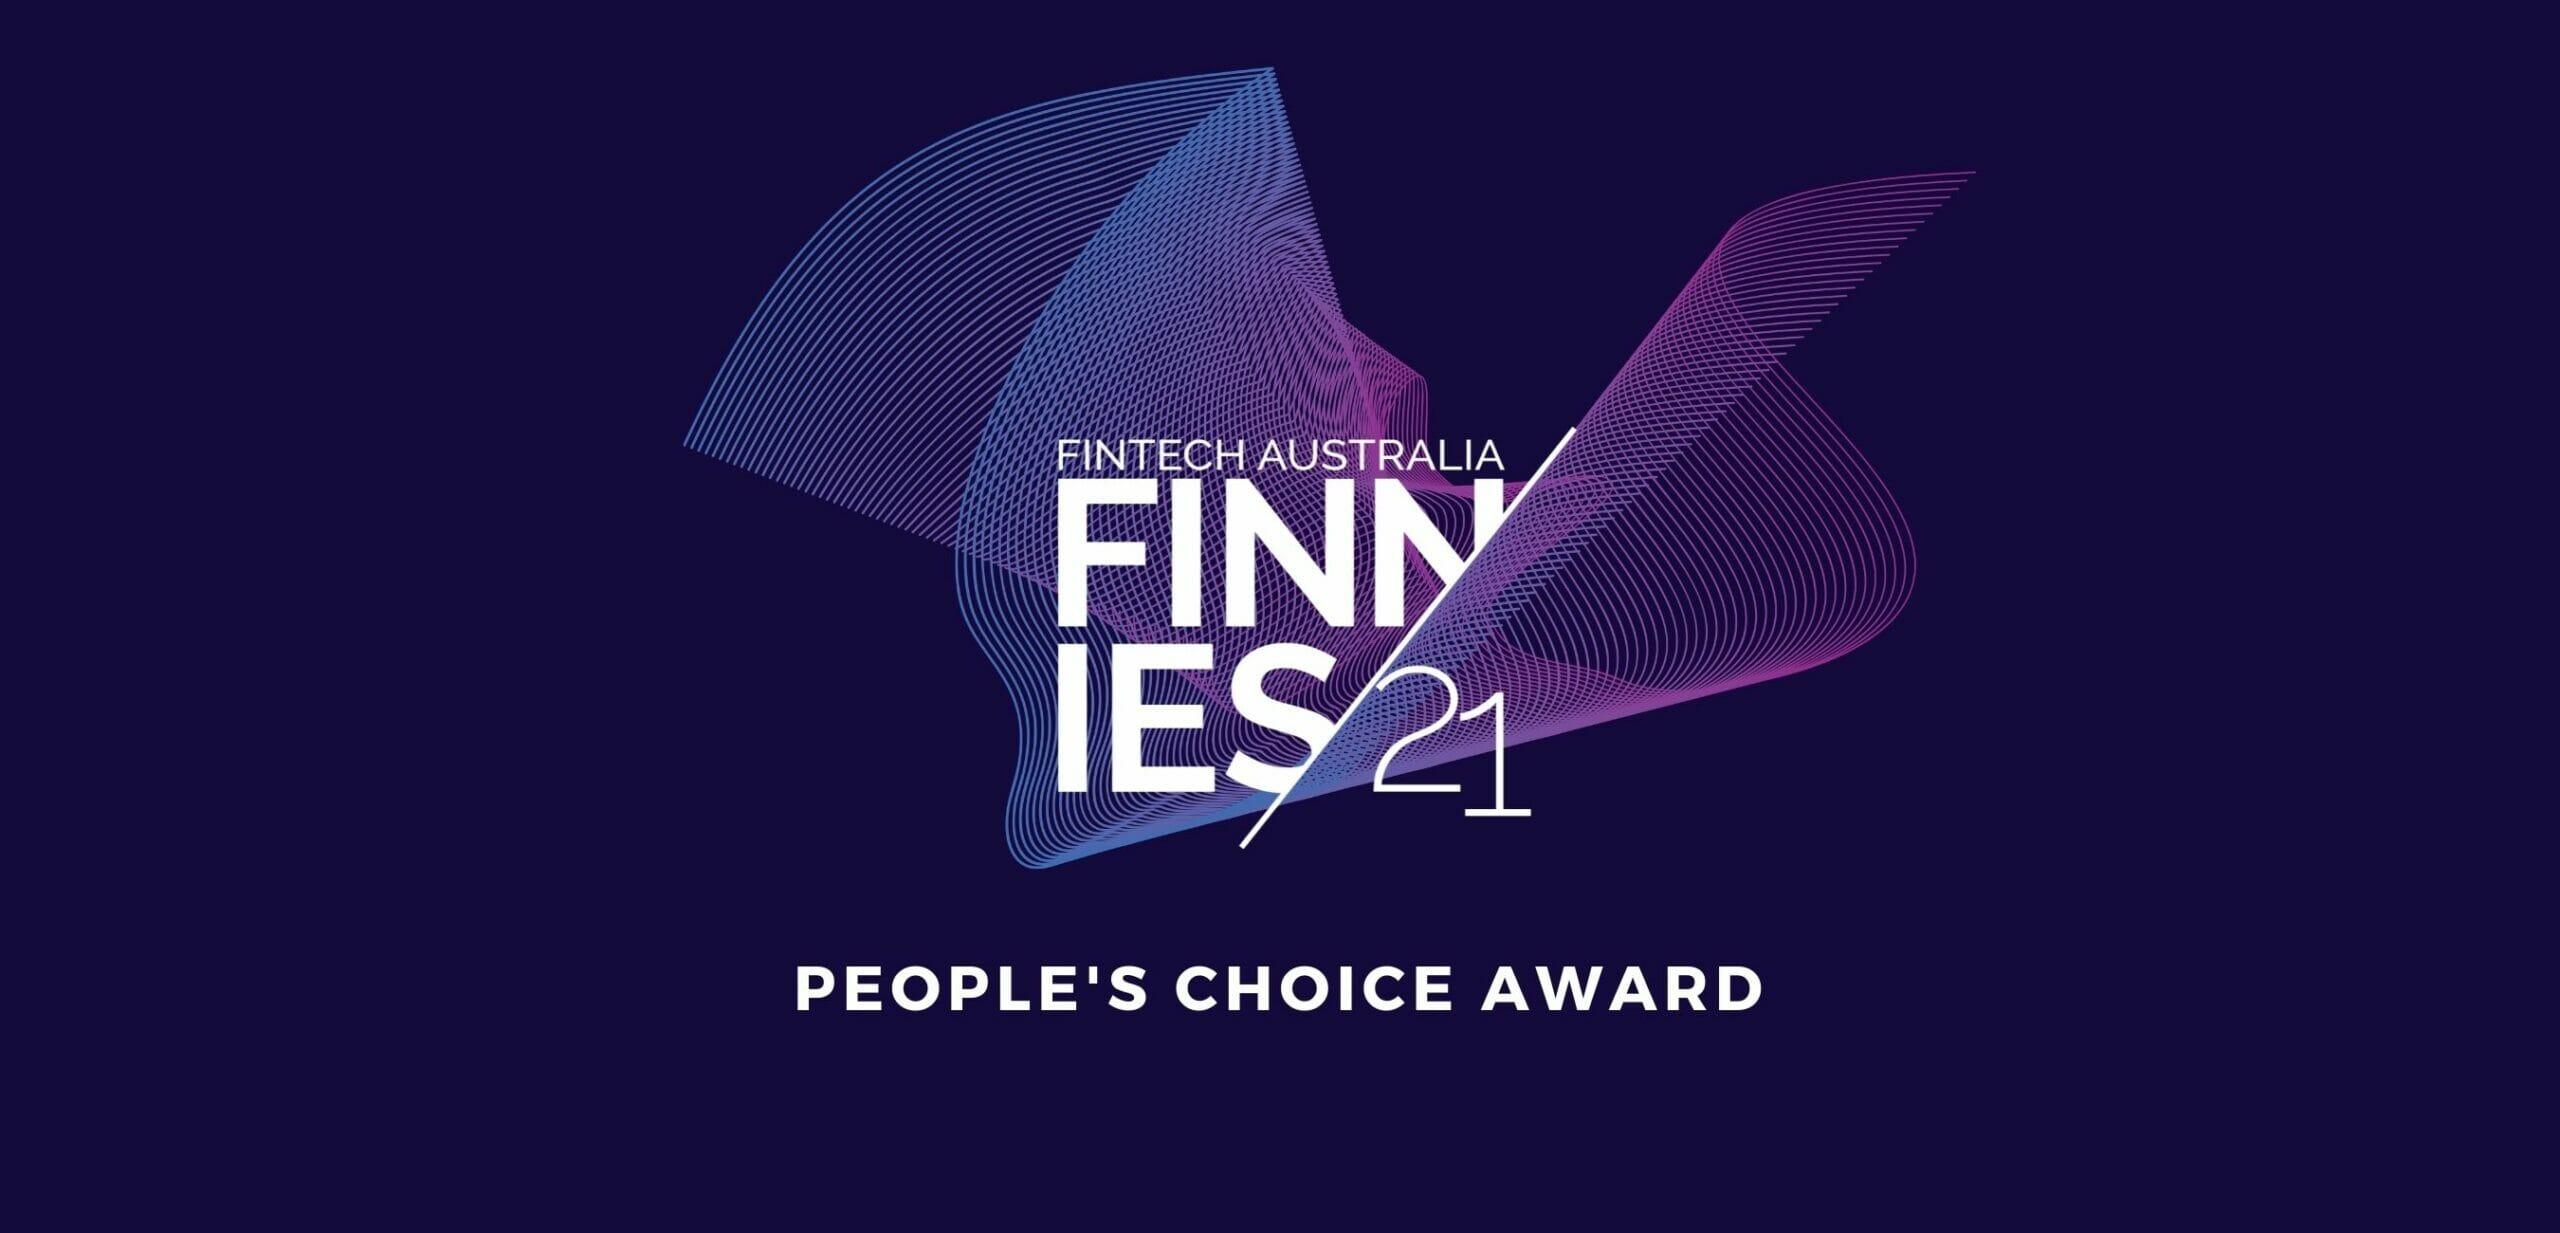 Finnies 2021 People's Choice Awards